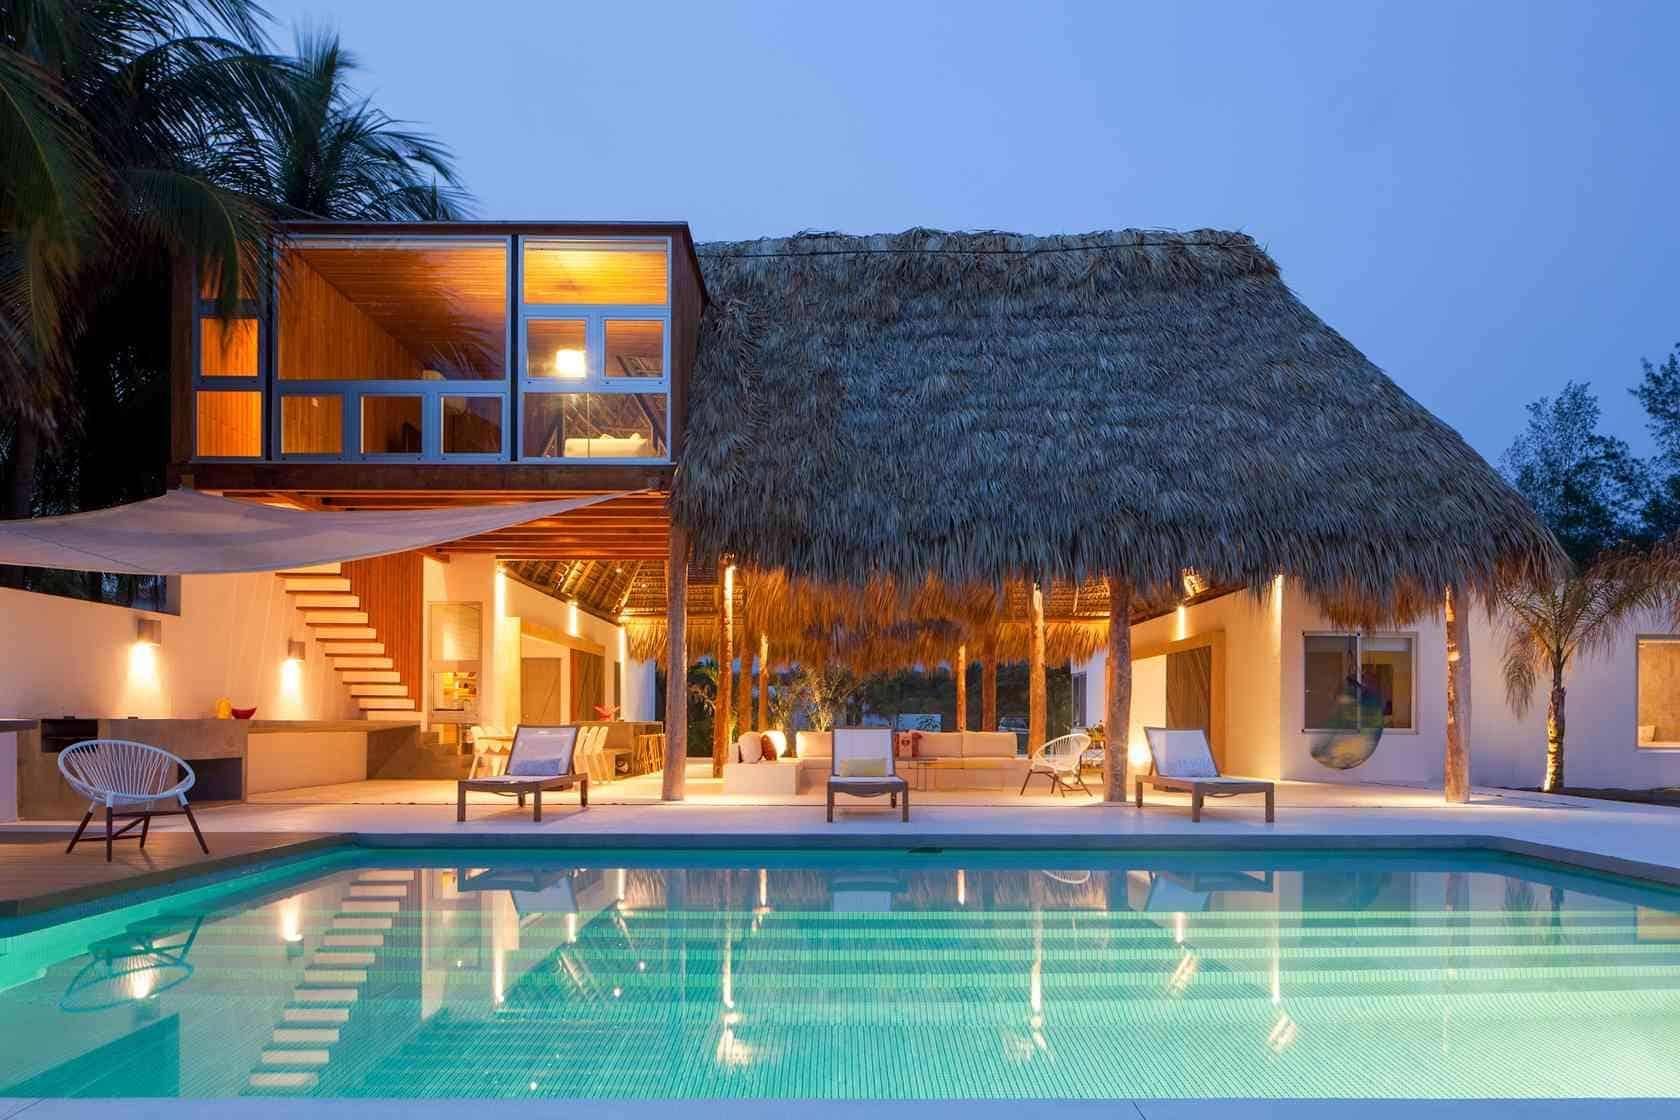 Astounding Open Home Design Images - Best interior design ...